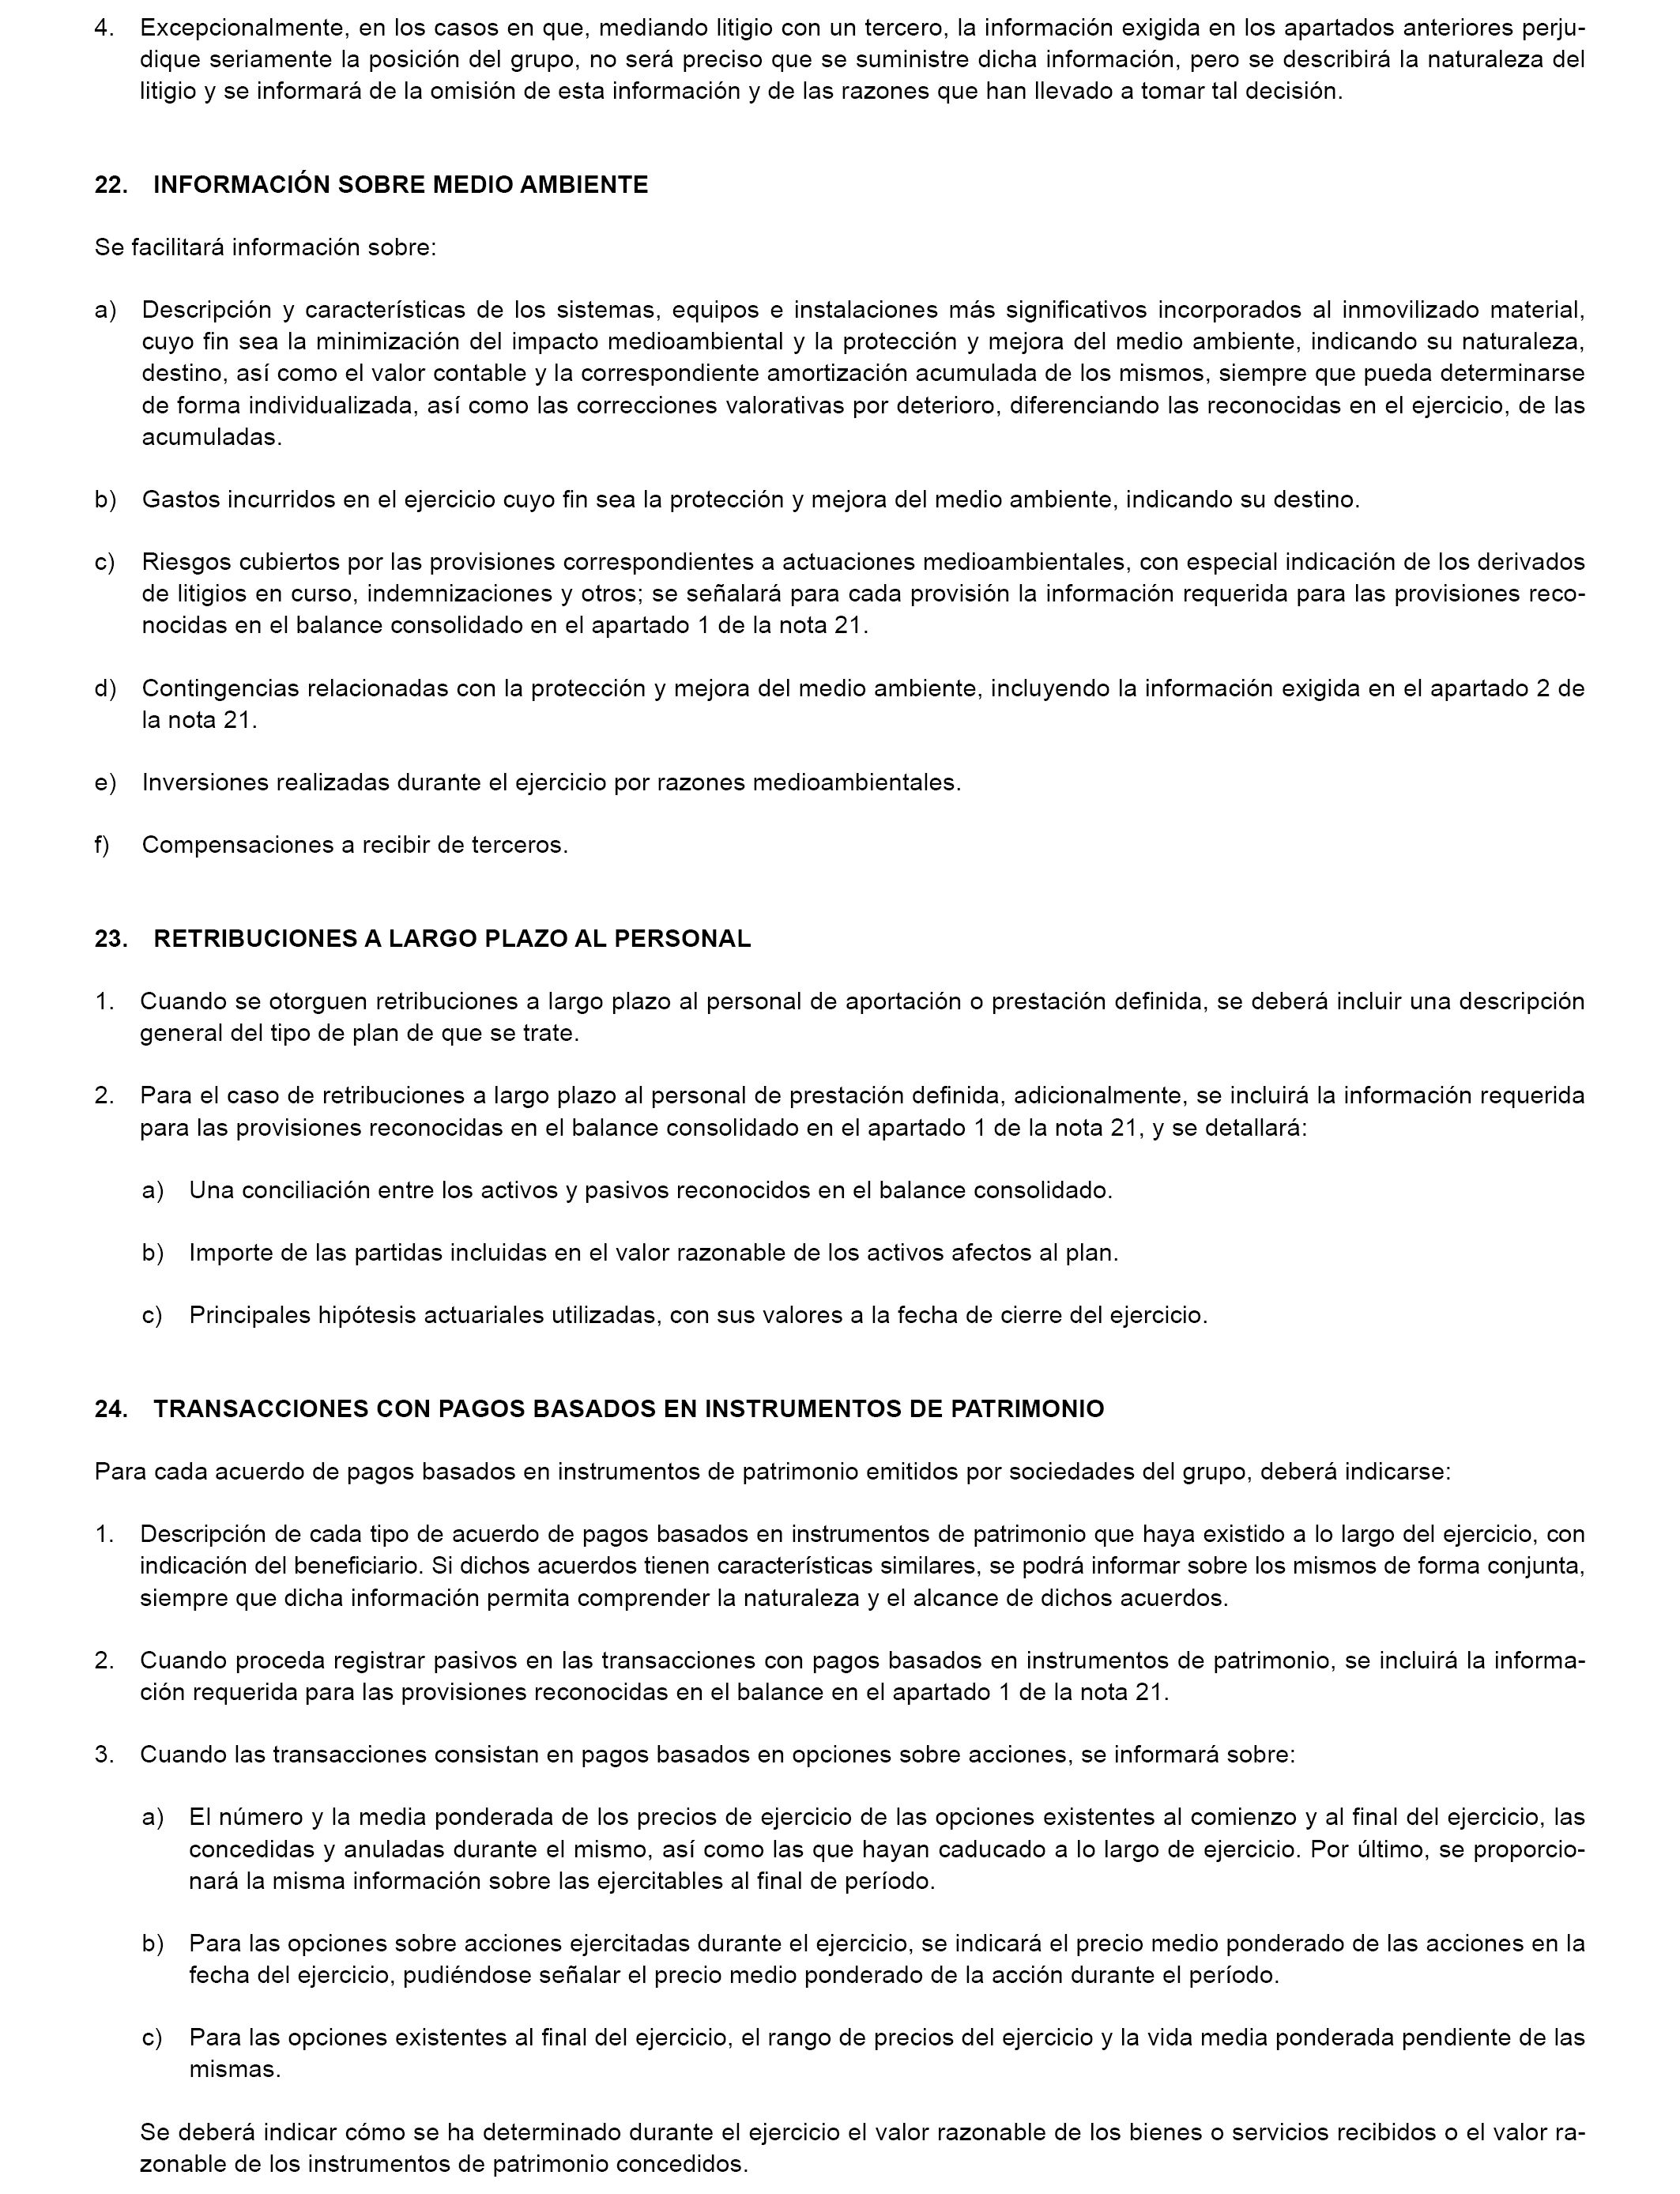 BOE.es - Documento BOE-A-2017-5774